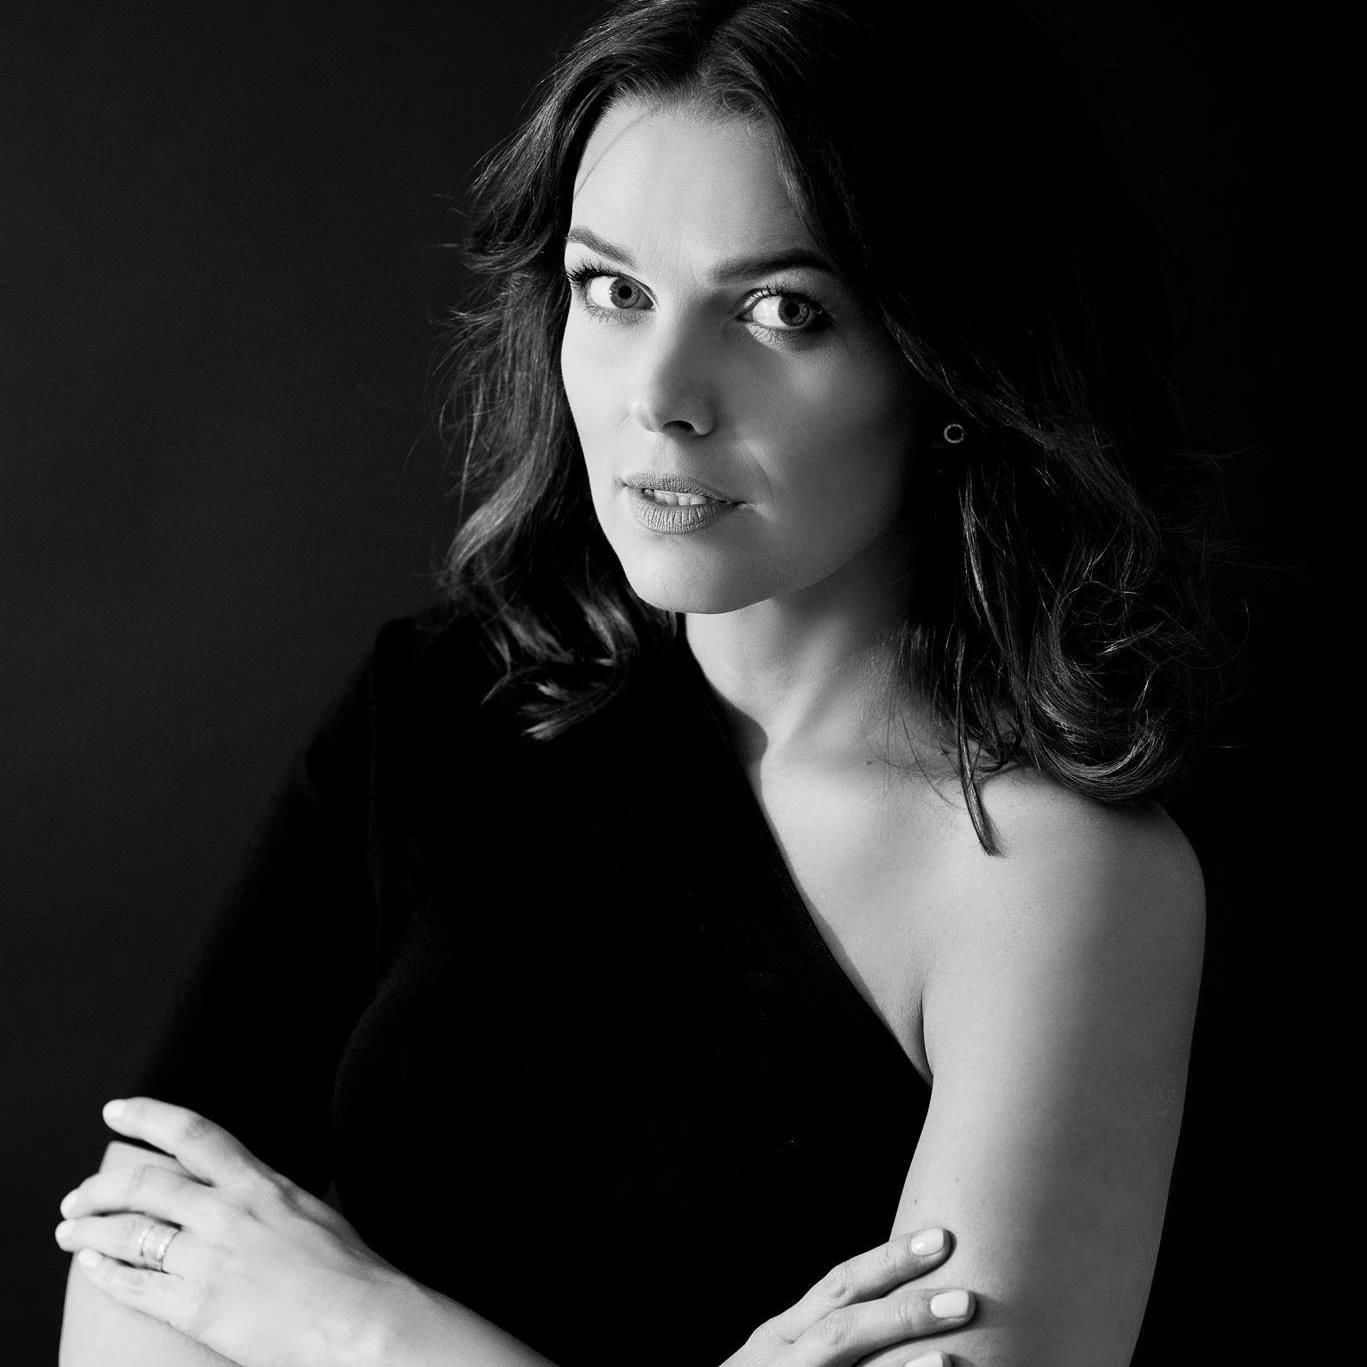 Marta Darowska